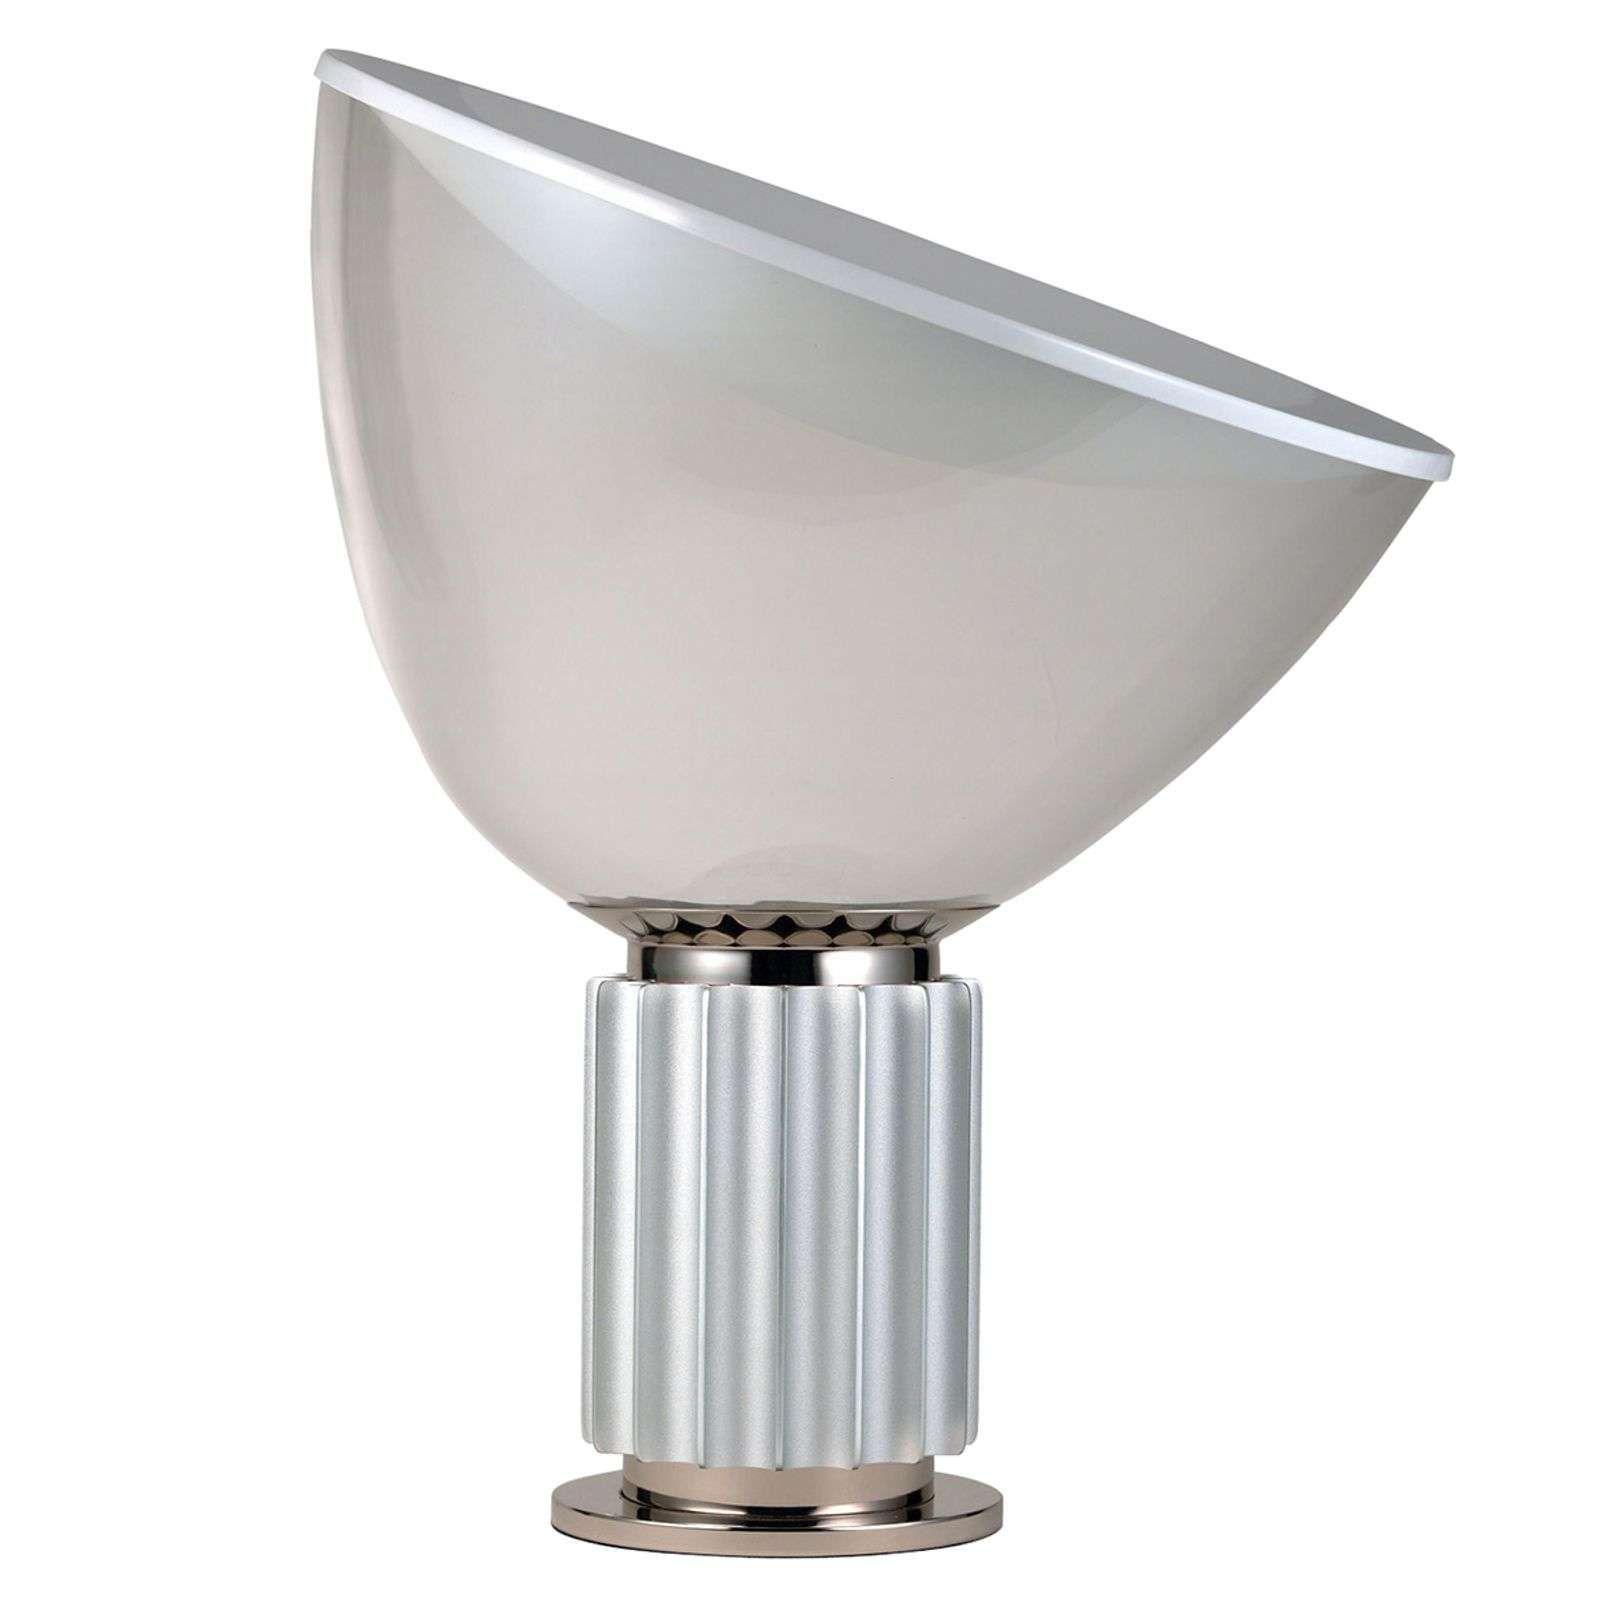 Nachttischleuchte Led Dimmbar Led Lampen Kaufen Karlsruhe Tischlampe Weiss Holz Led Tischlampe Led Tischleu Lampe Design Lampes Contemporaines Luminaire